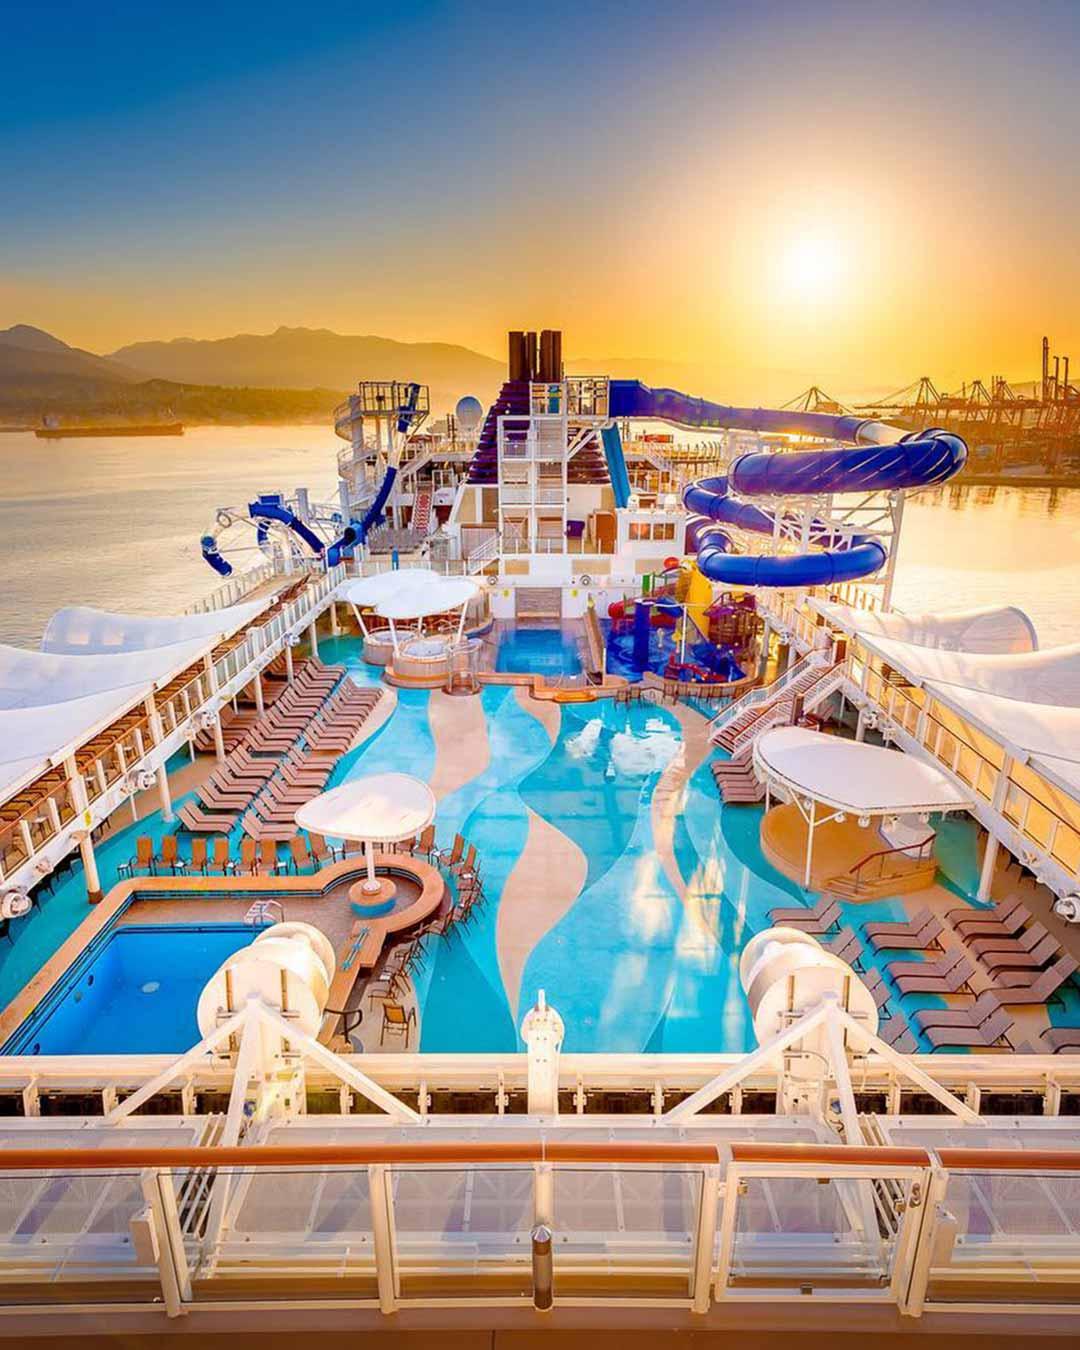 ncl-ship-sunset-1080x1350